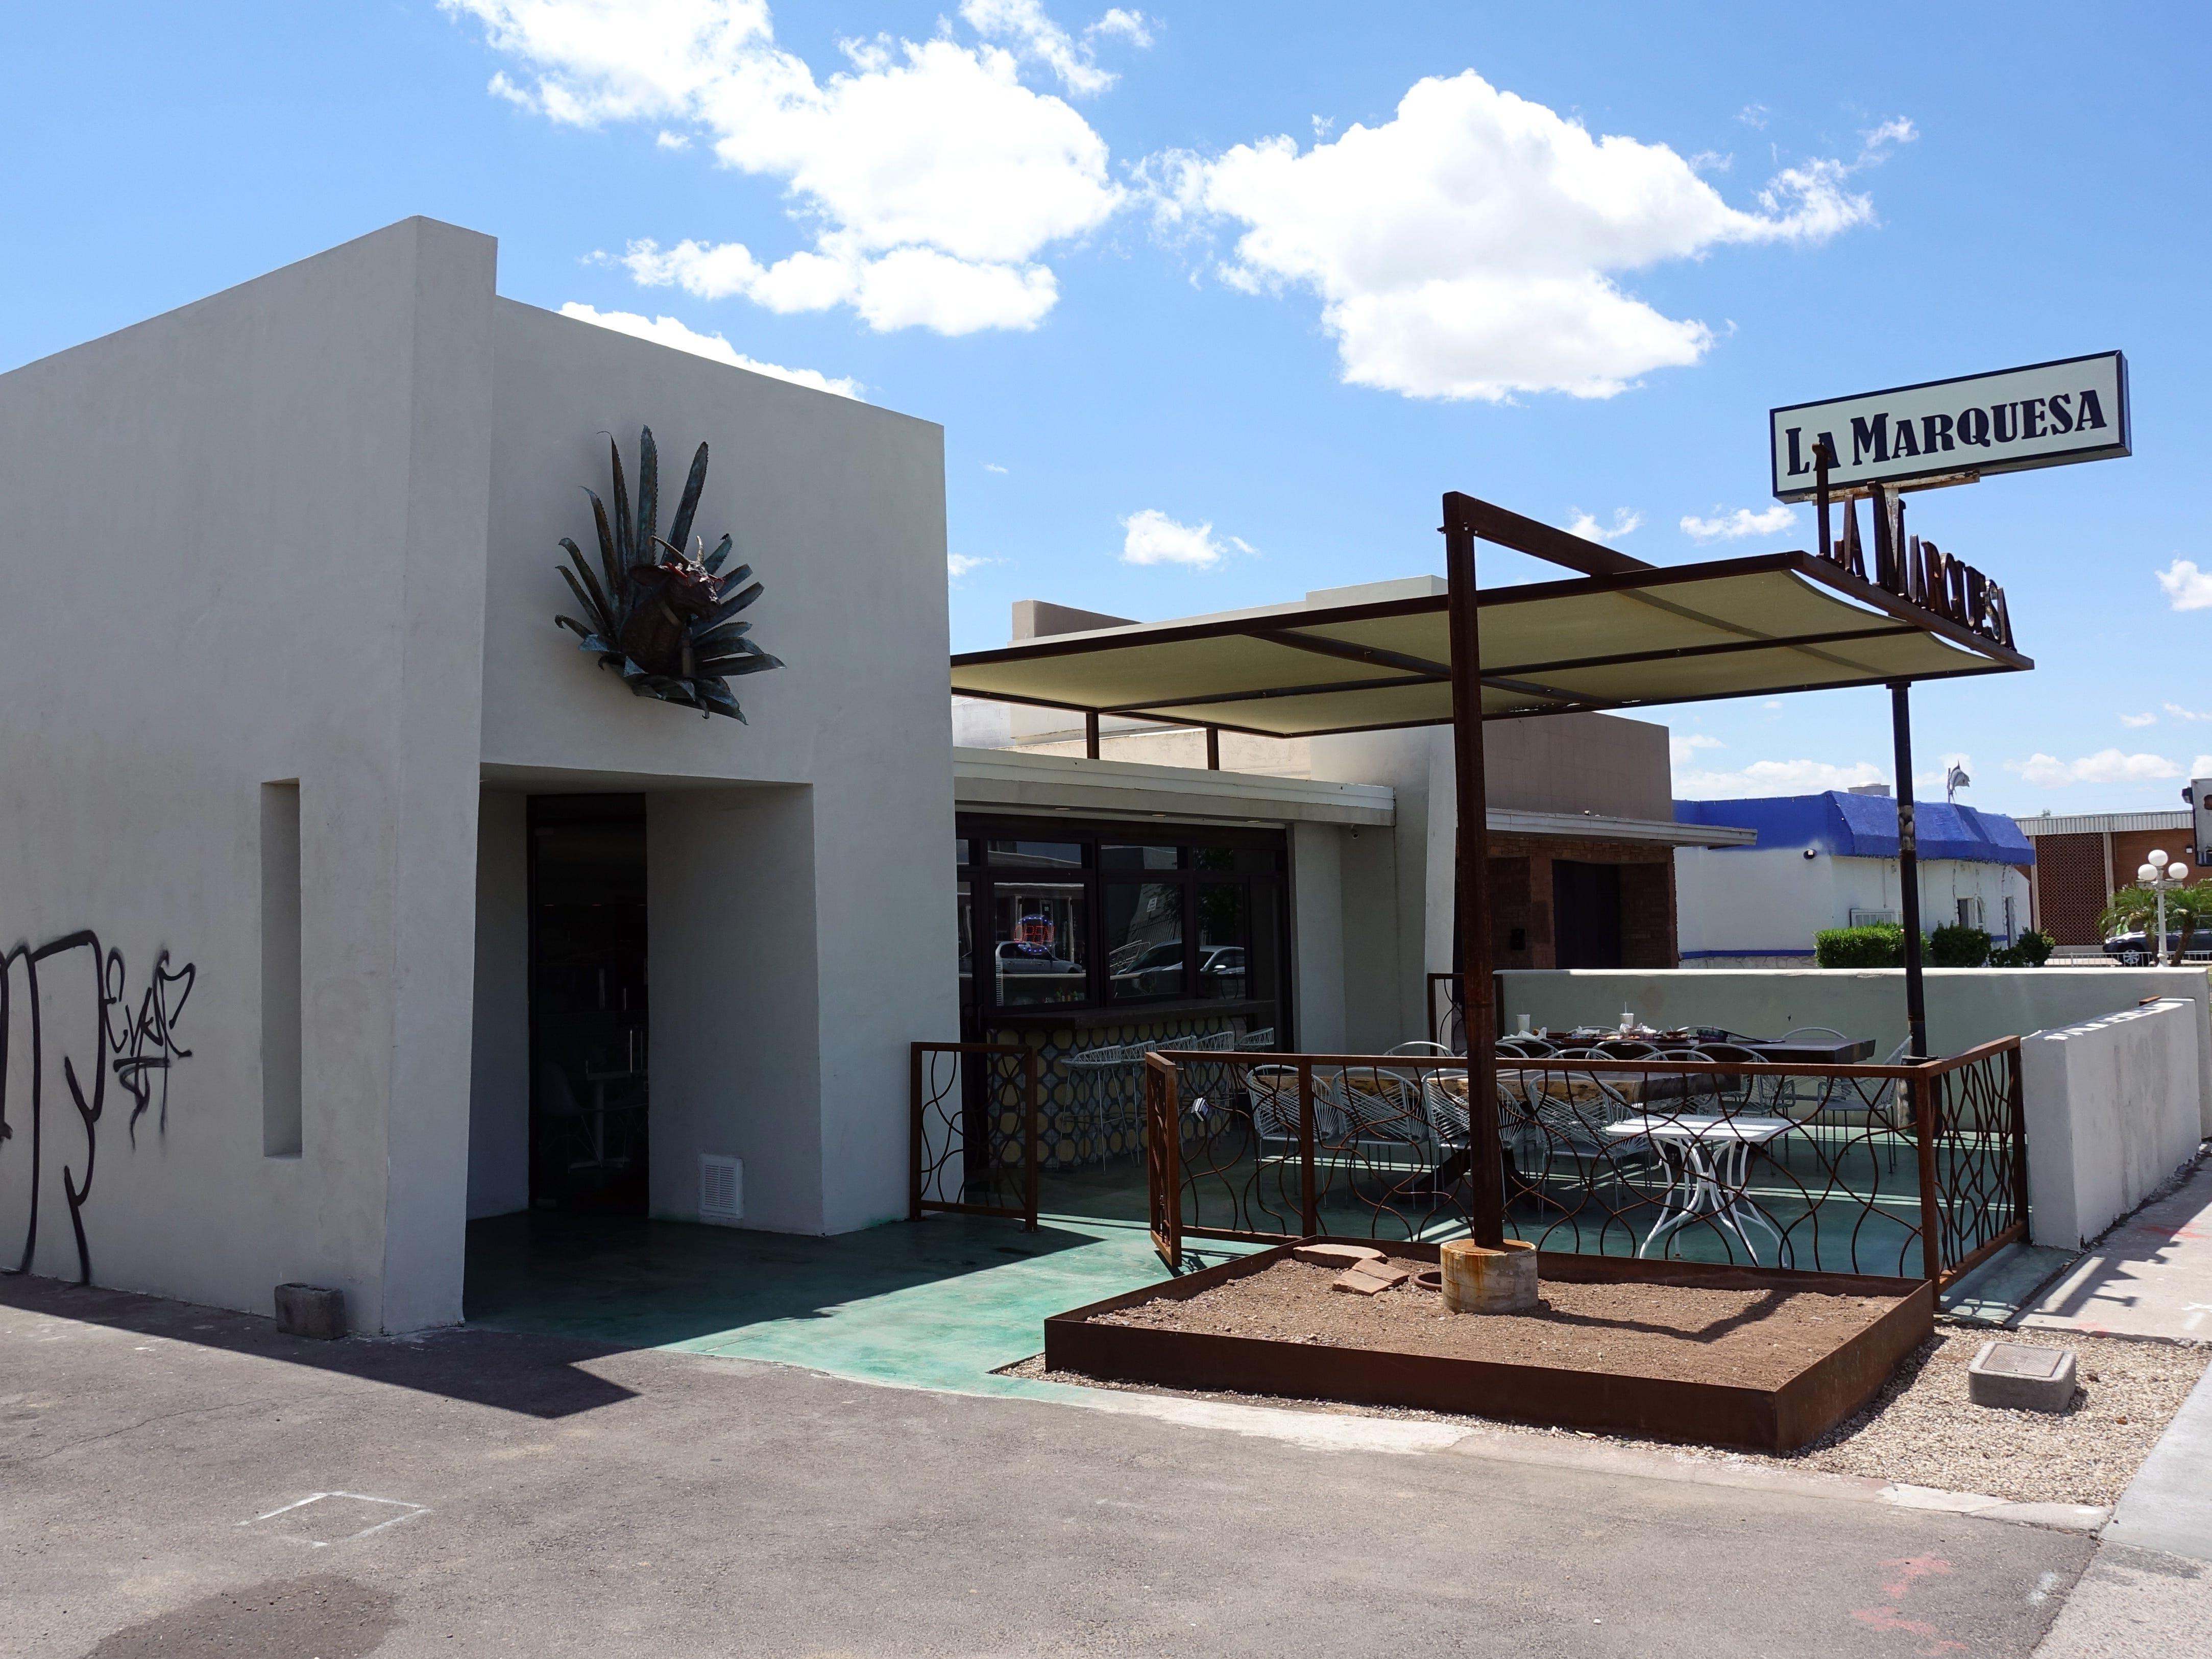 The exterior of La Marquesa in Phoenix.